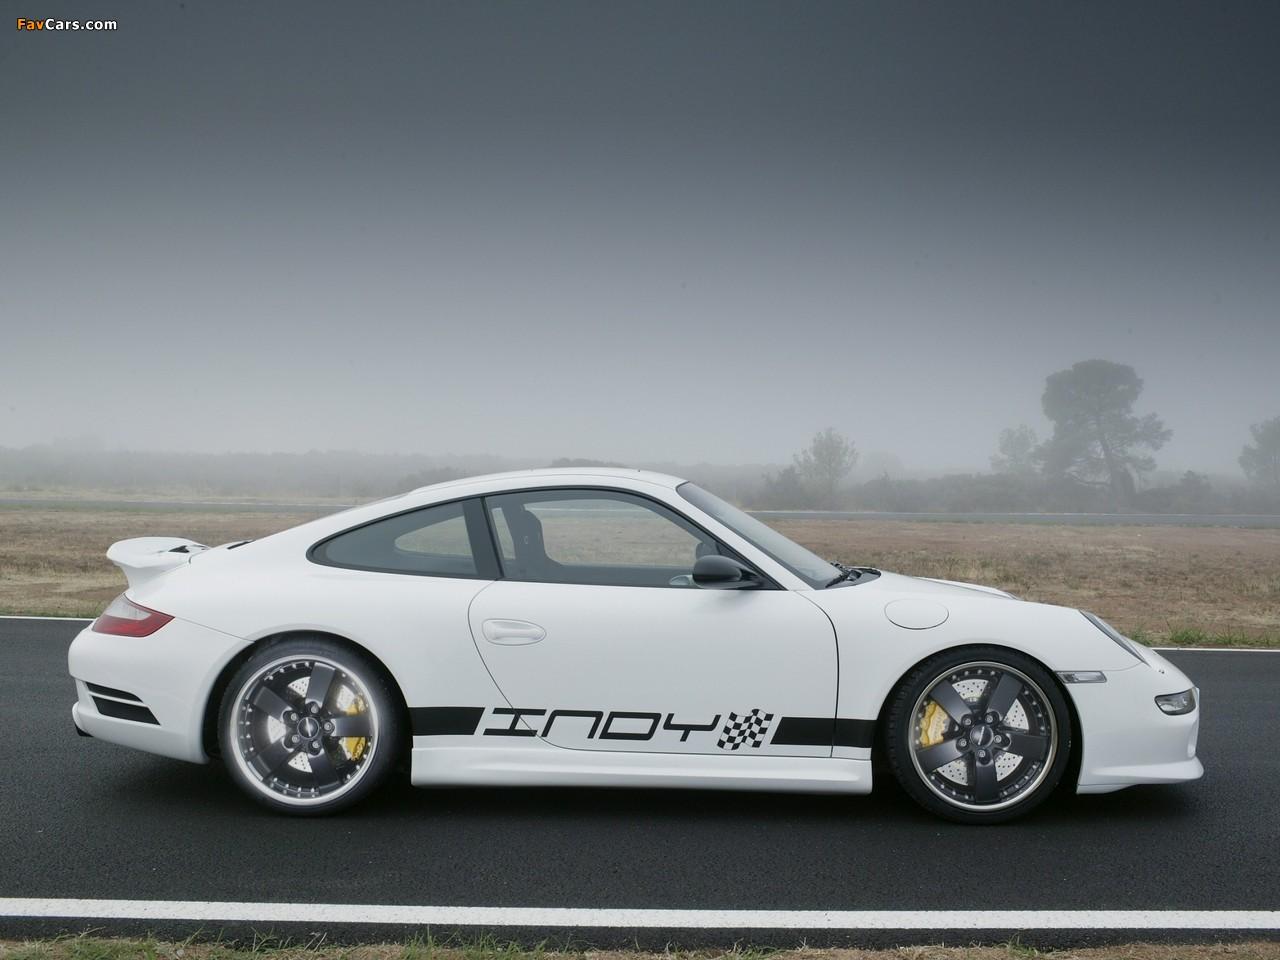 Rinspeed Porsche Indy (997) 2005 images (1280 x 960)